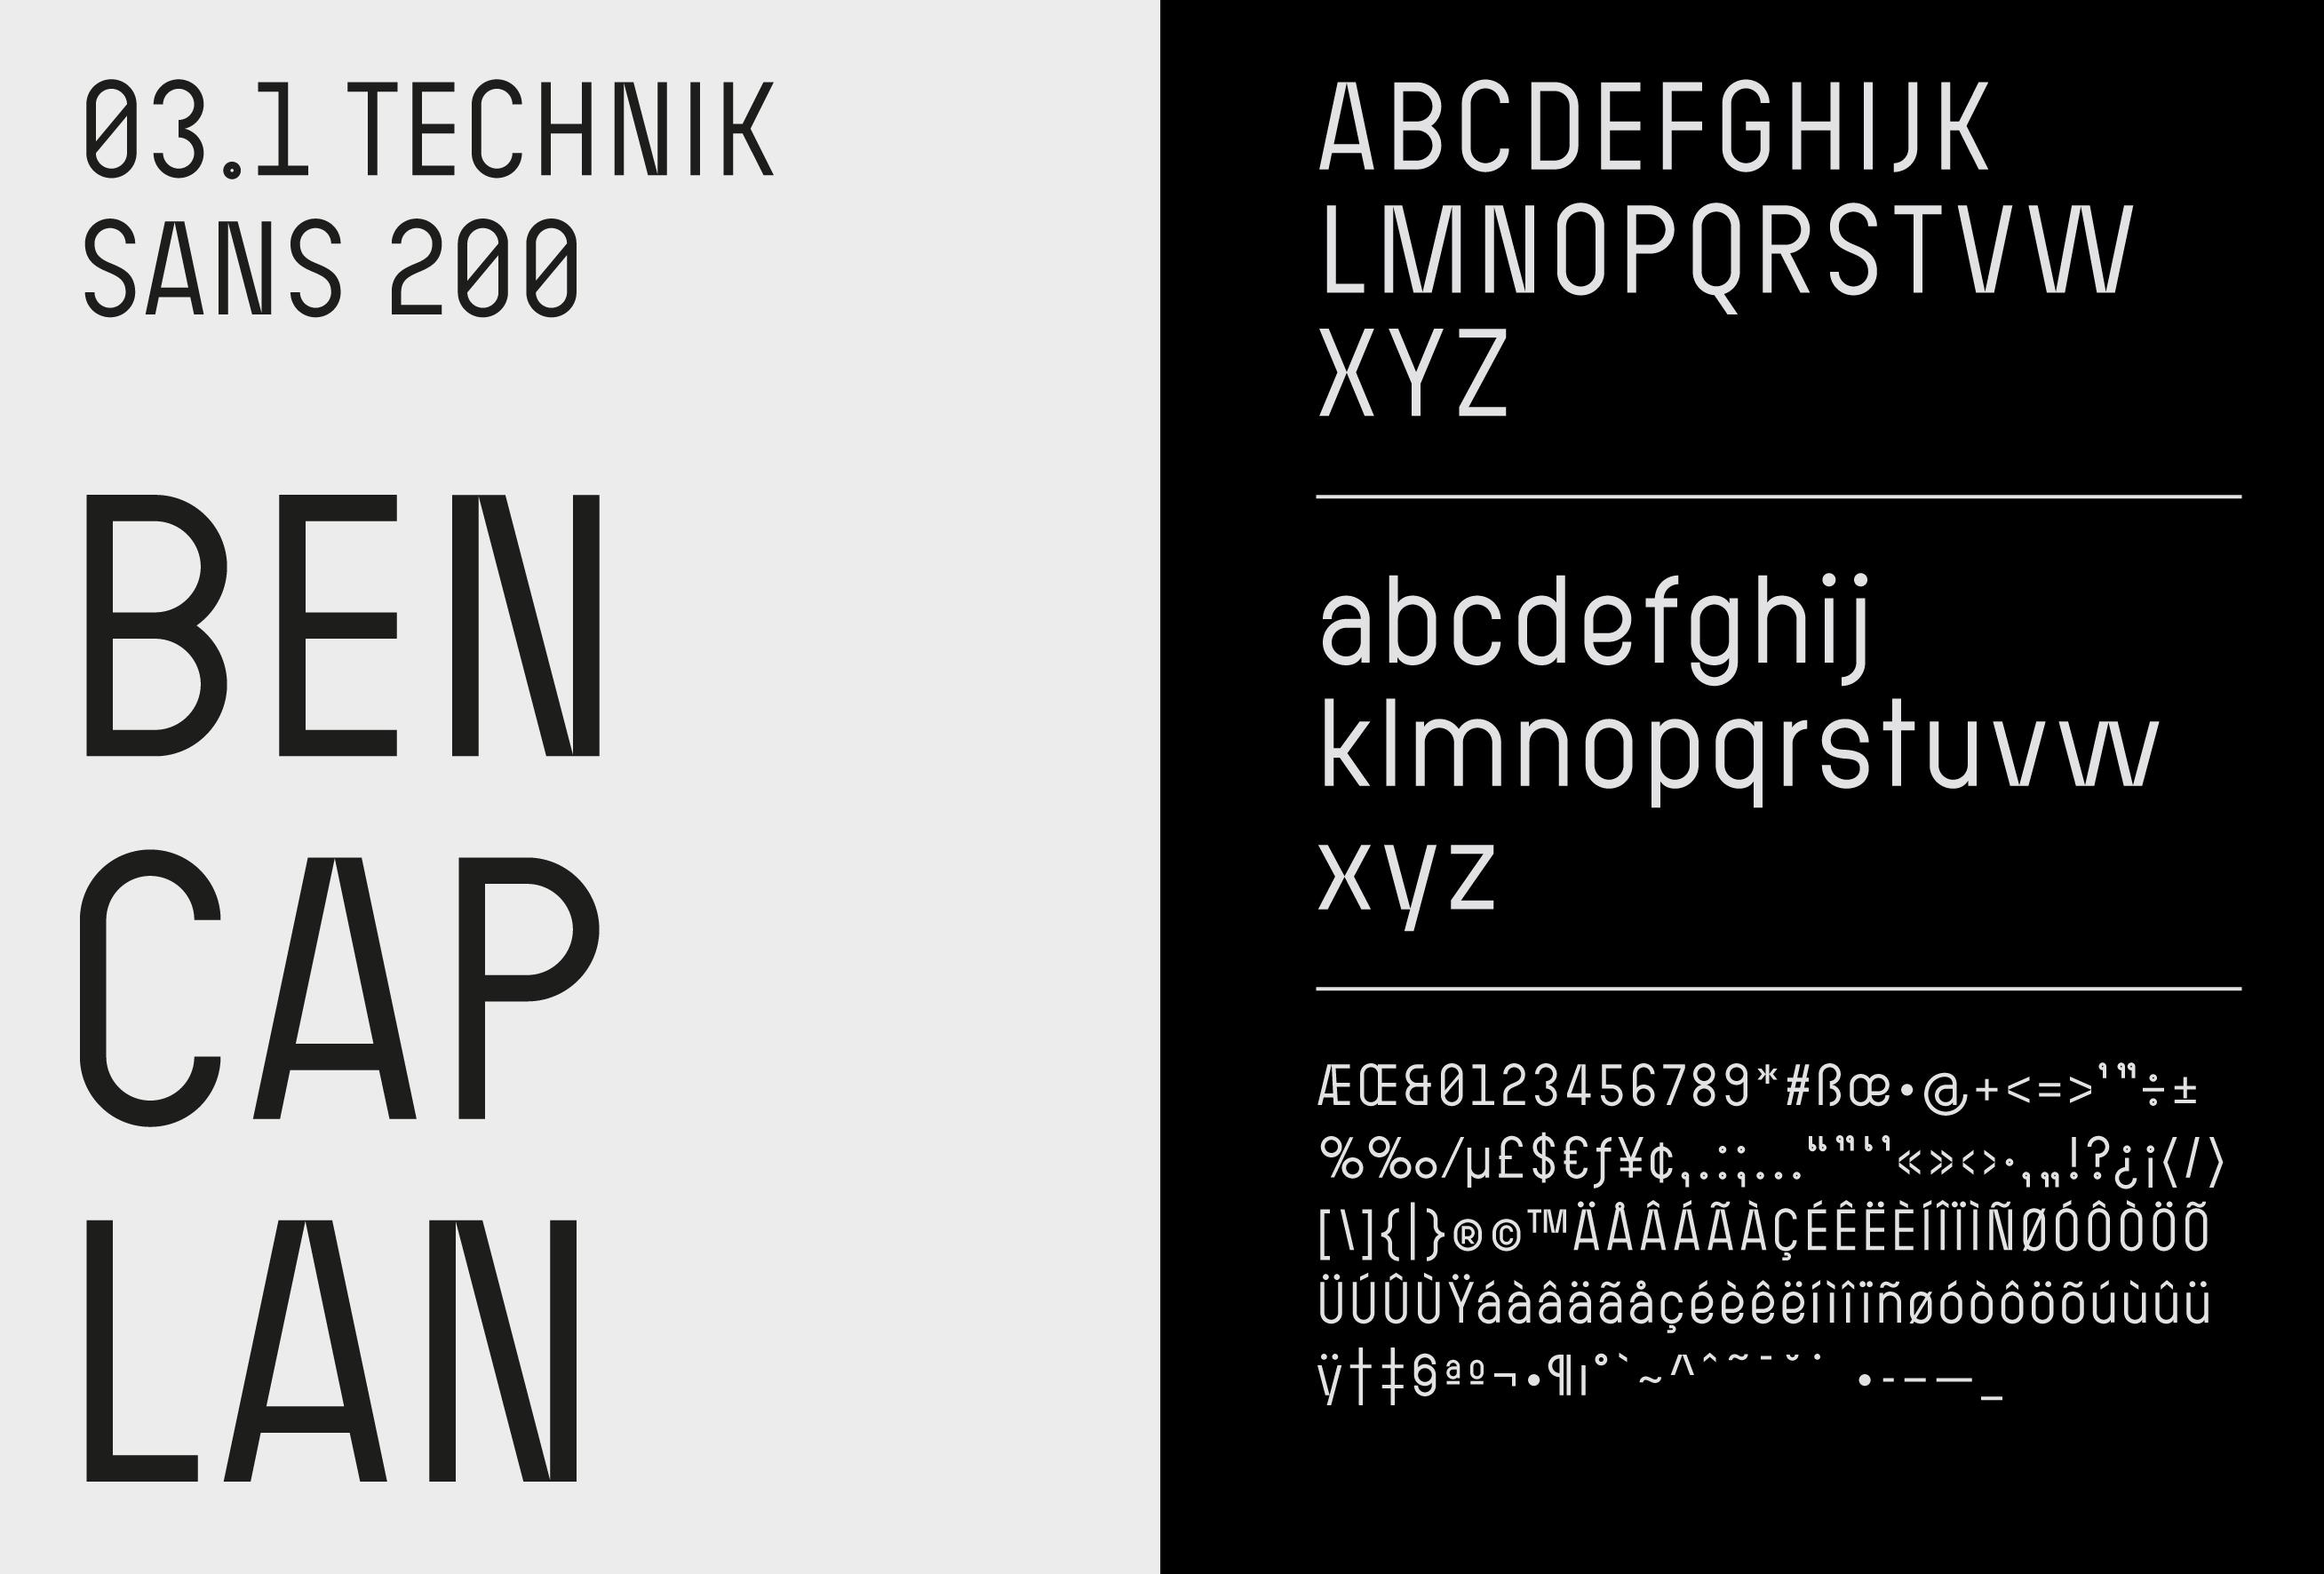 Technik_05.png